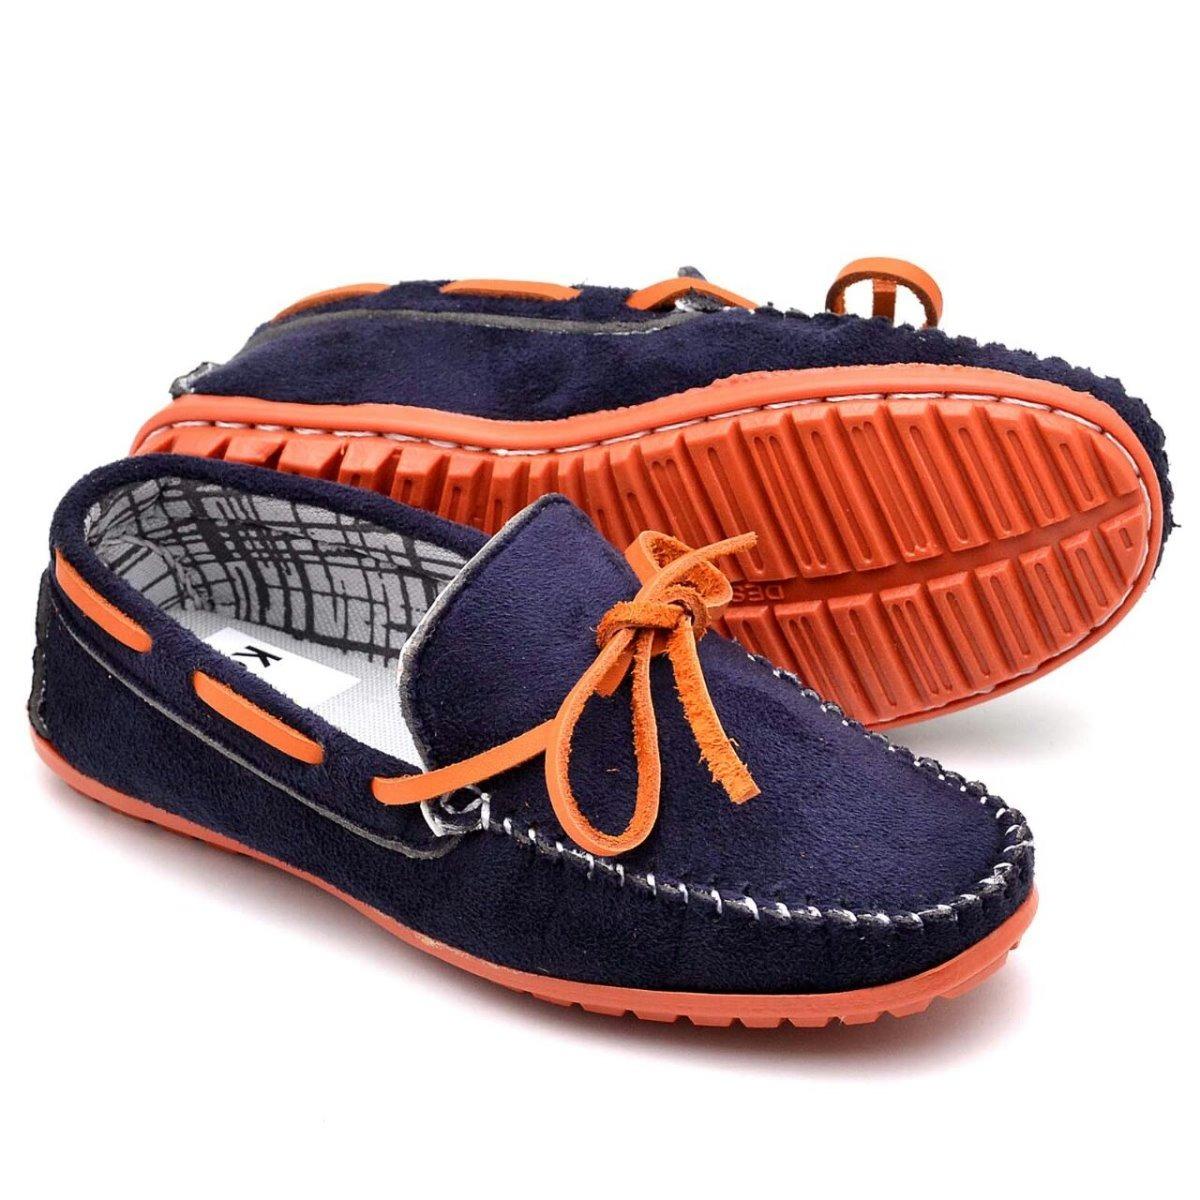 9d6e5ed117 sapato mocassim infantil masculino 100% couro casual social. Carregando  zoom.